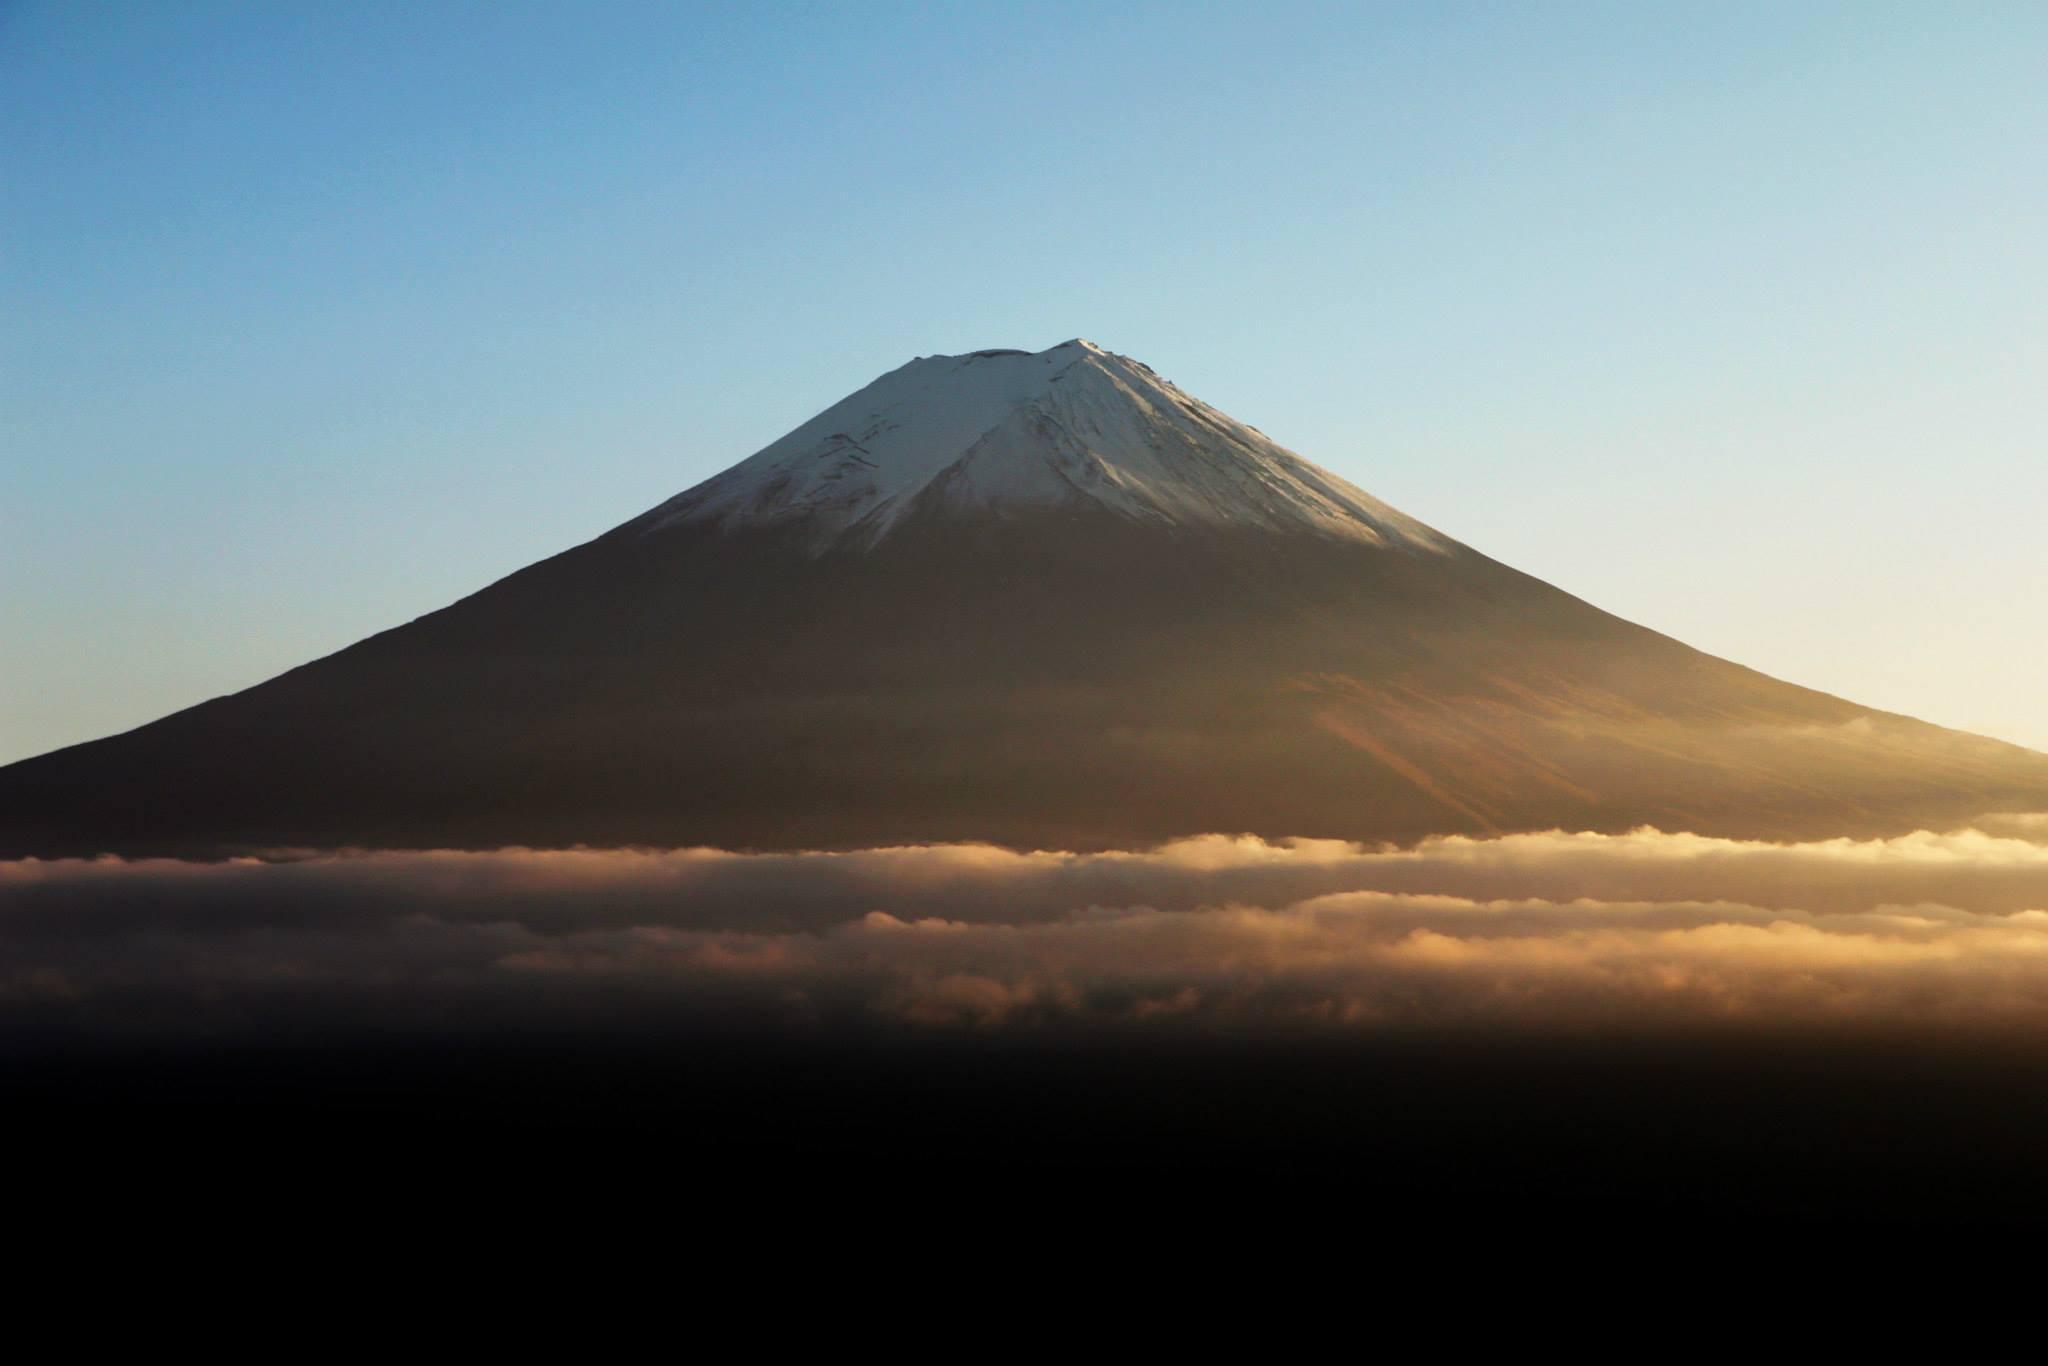 Mount Fuji, gezien vanaf Mount Tenjo in Kawakuchiko